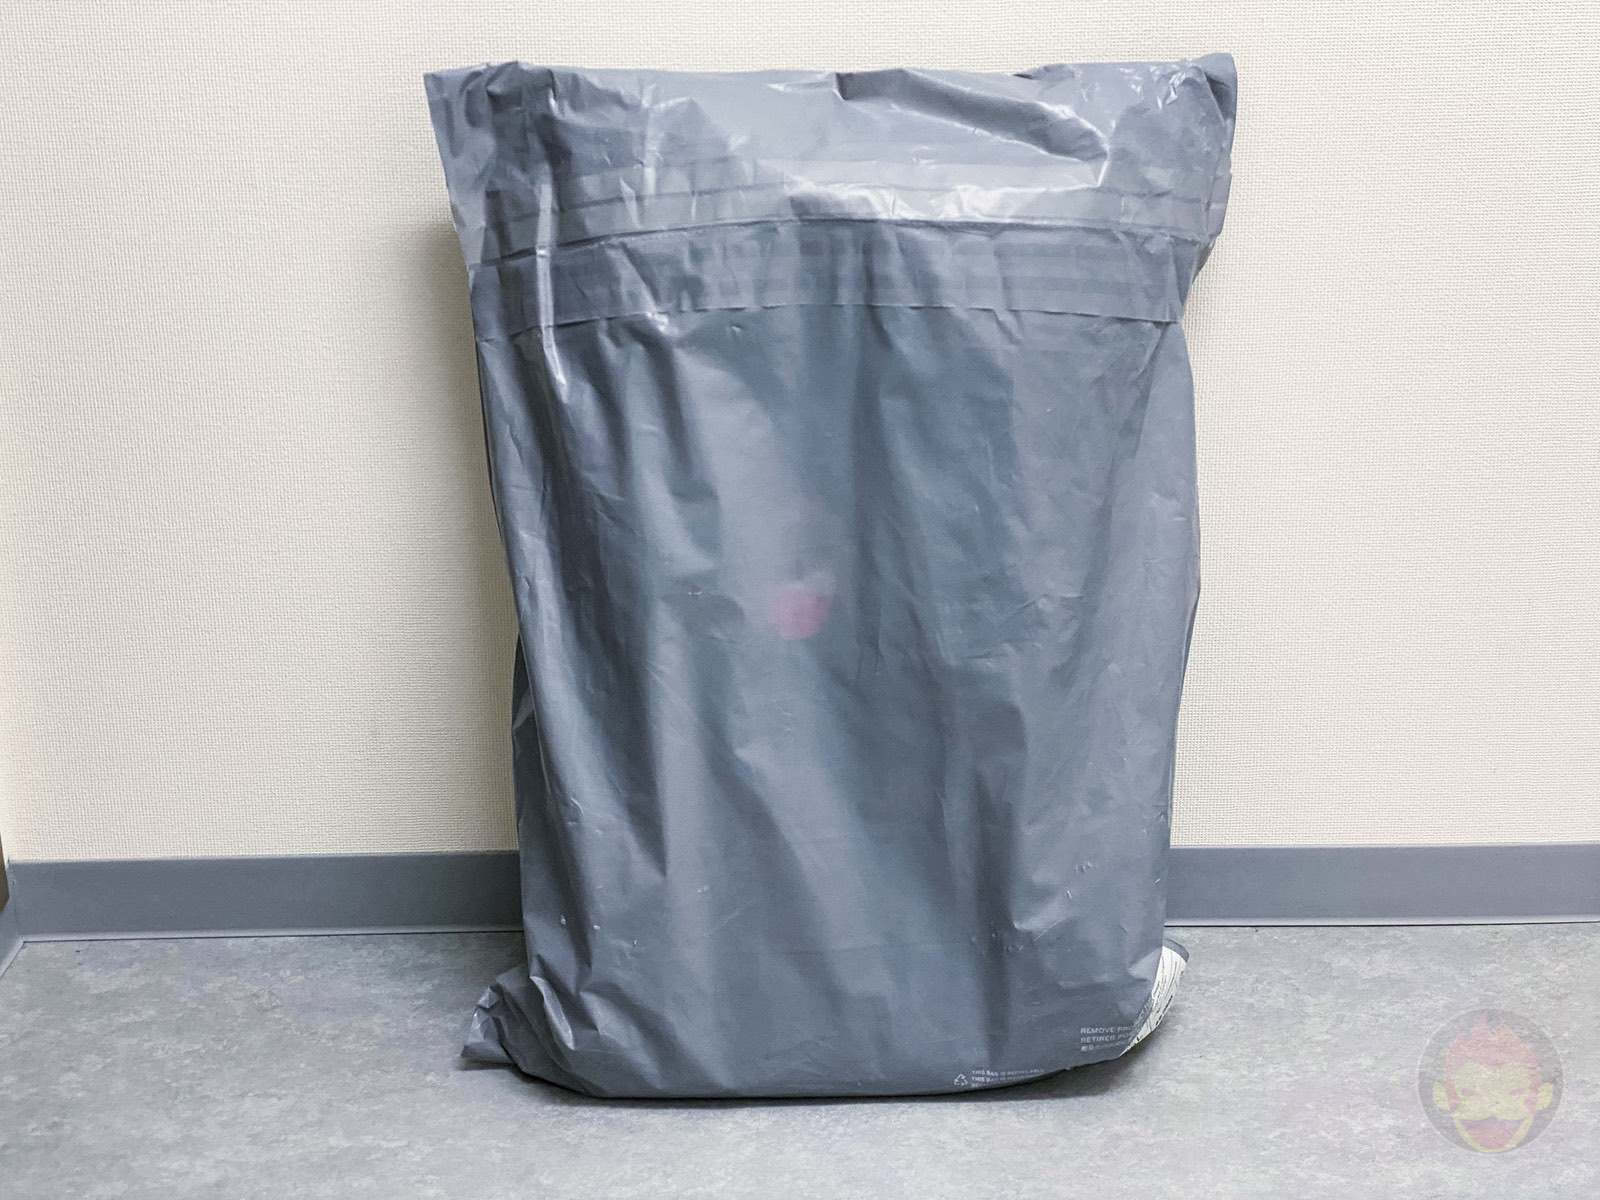 Kickstarter-bought-bag-came-back-as-a-new-bag-04.jpg